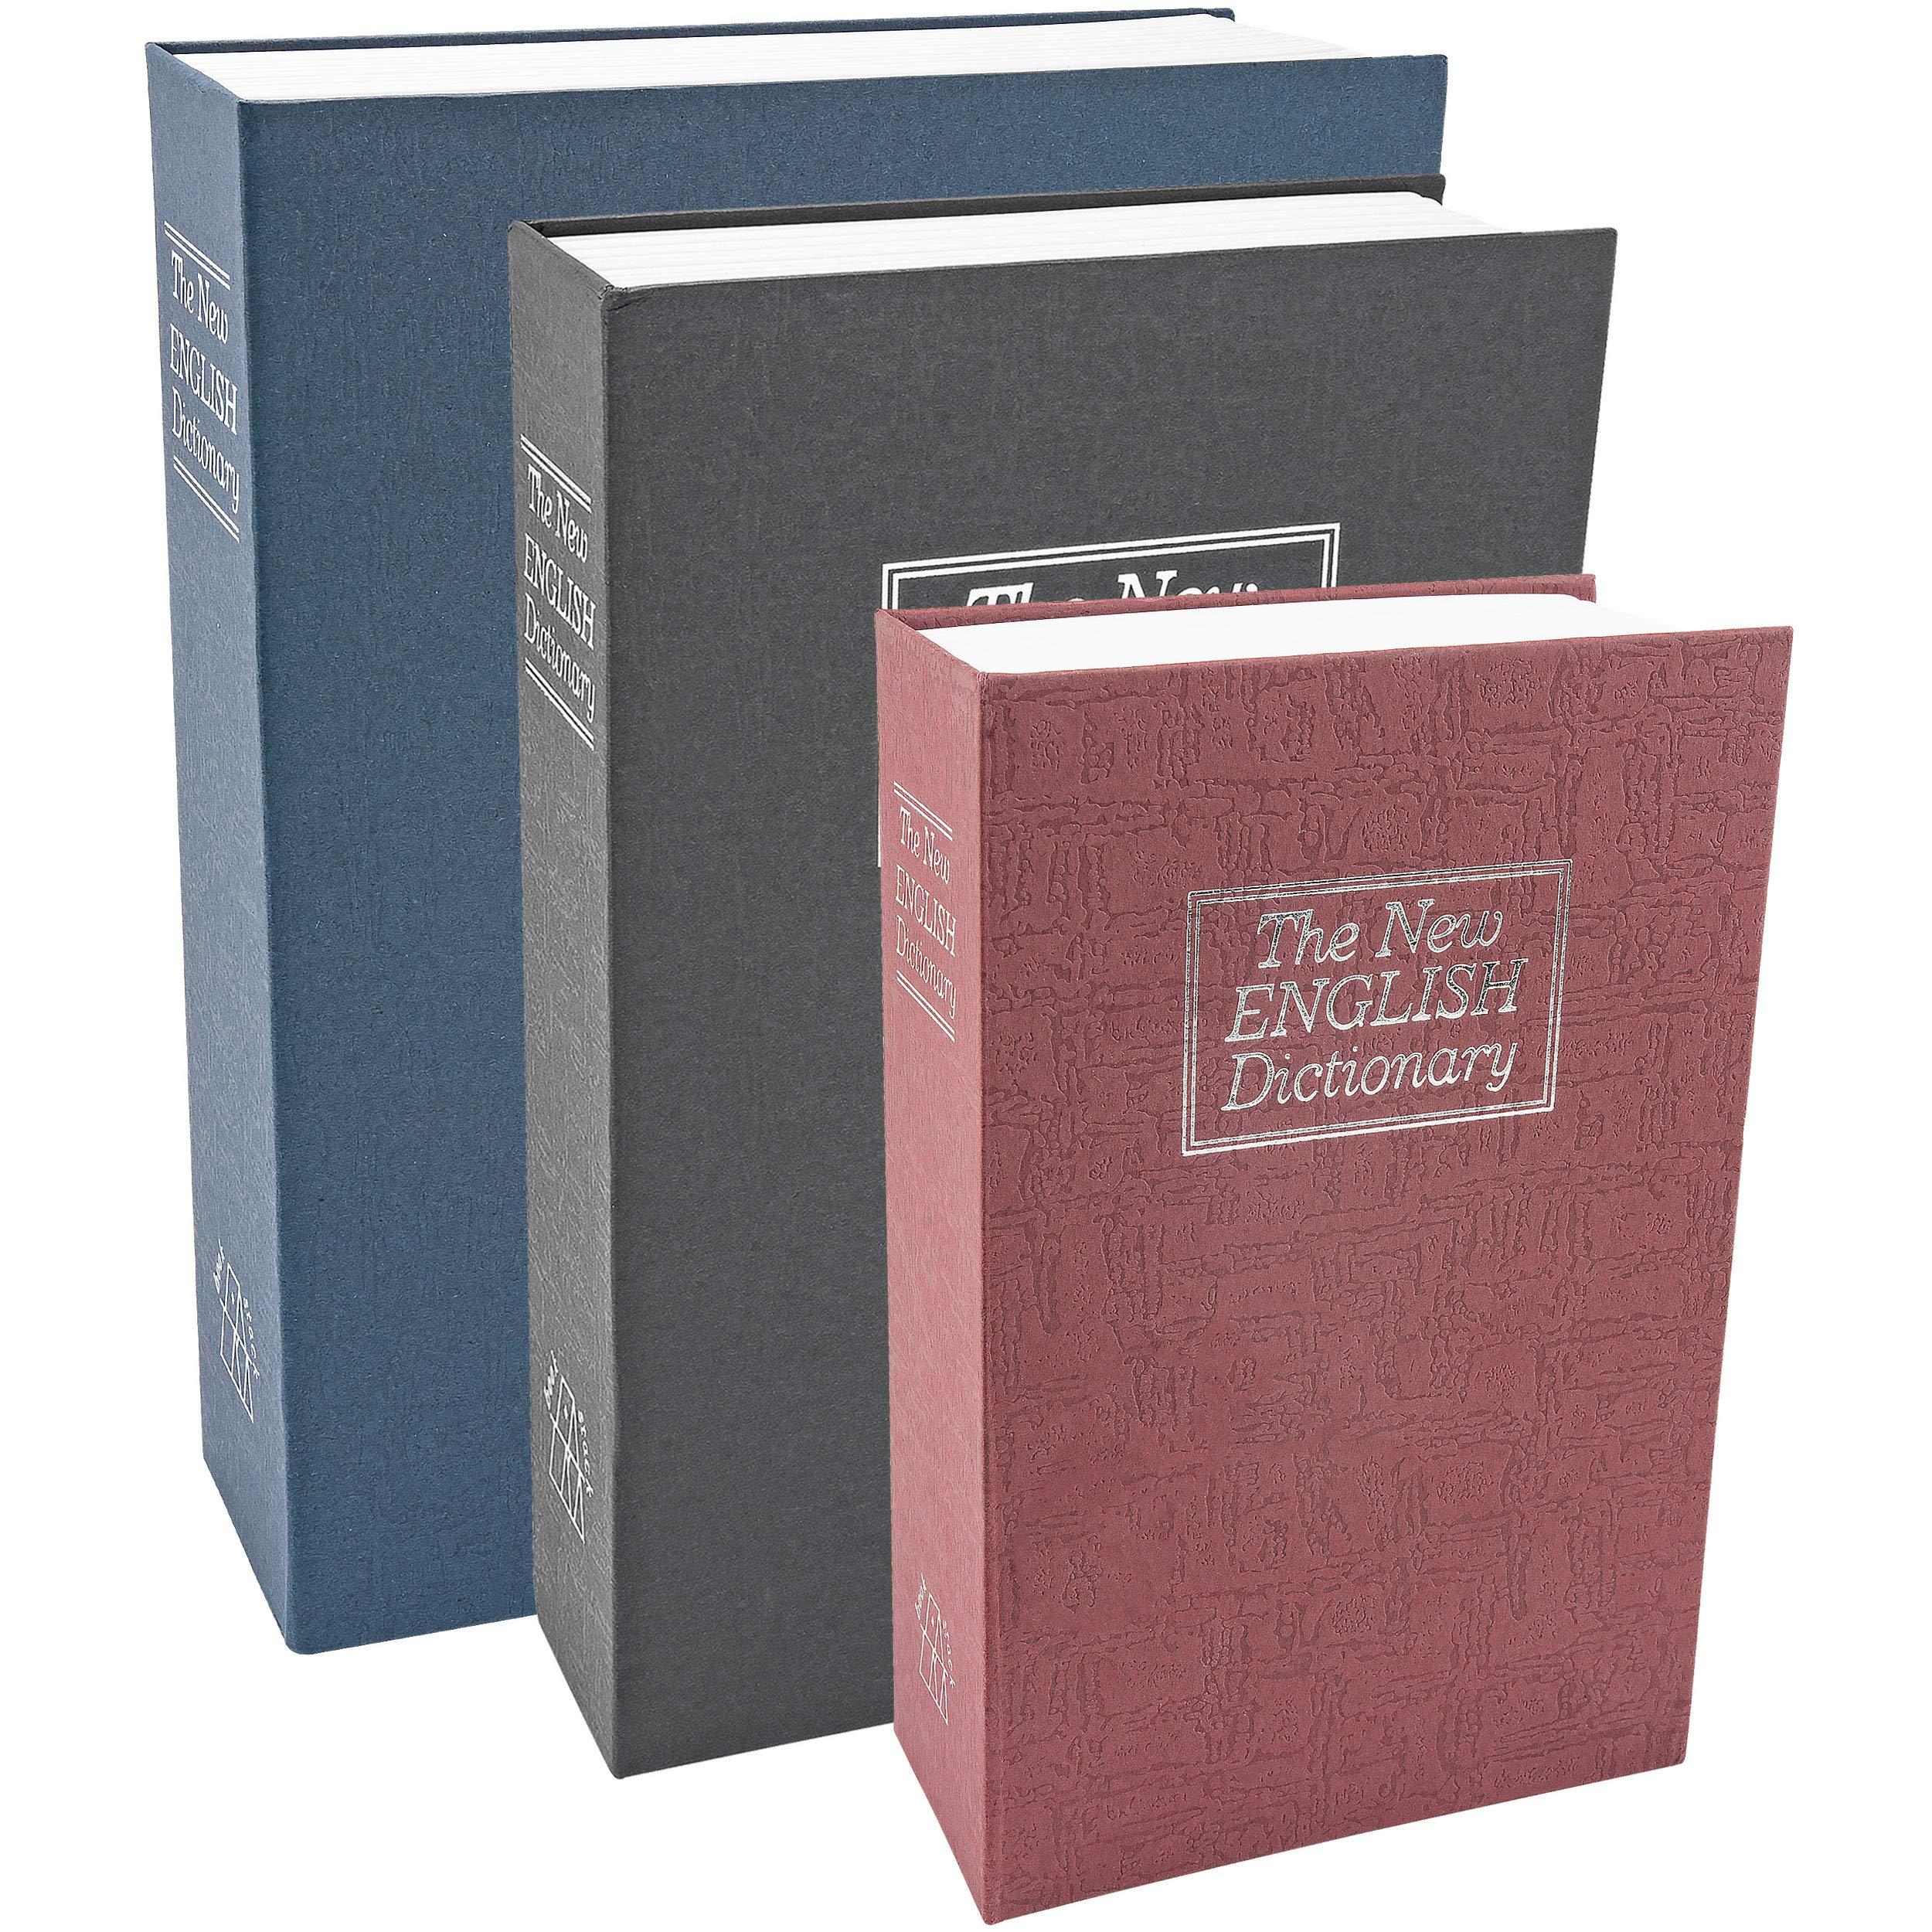 Southern Homewares SH-10189 Diversion Safe Dictionary Diversion Lock Box Book Safe, Set of 3